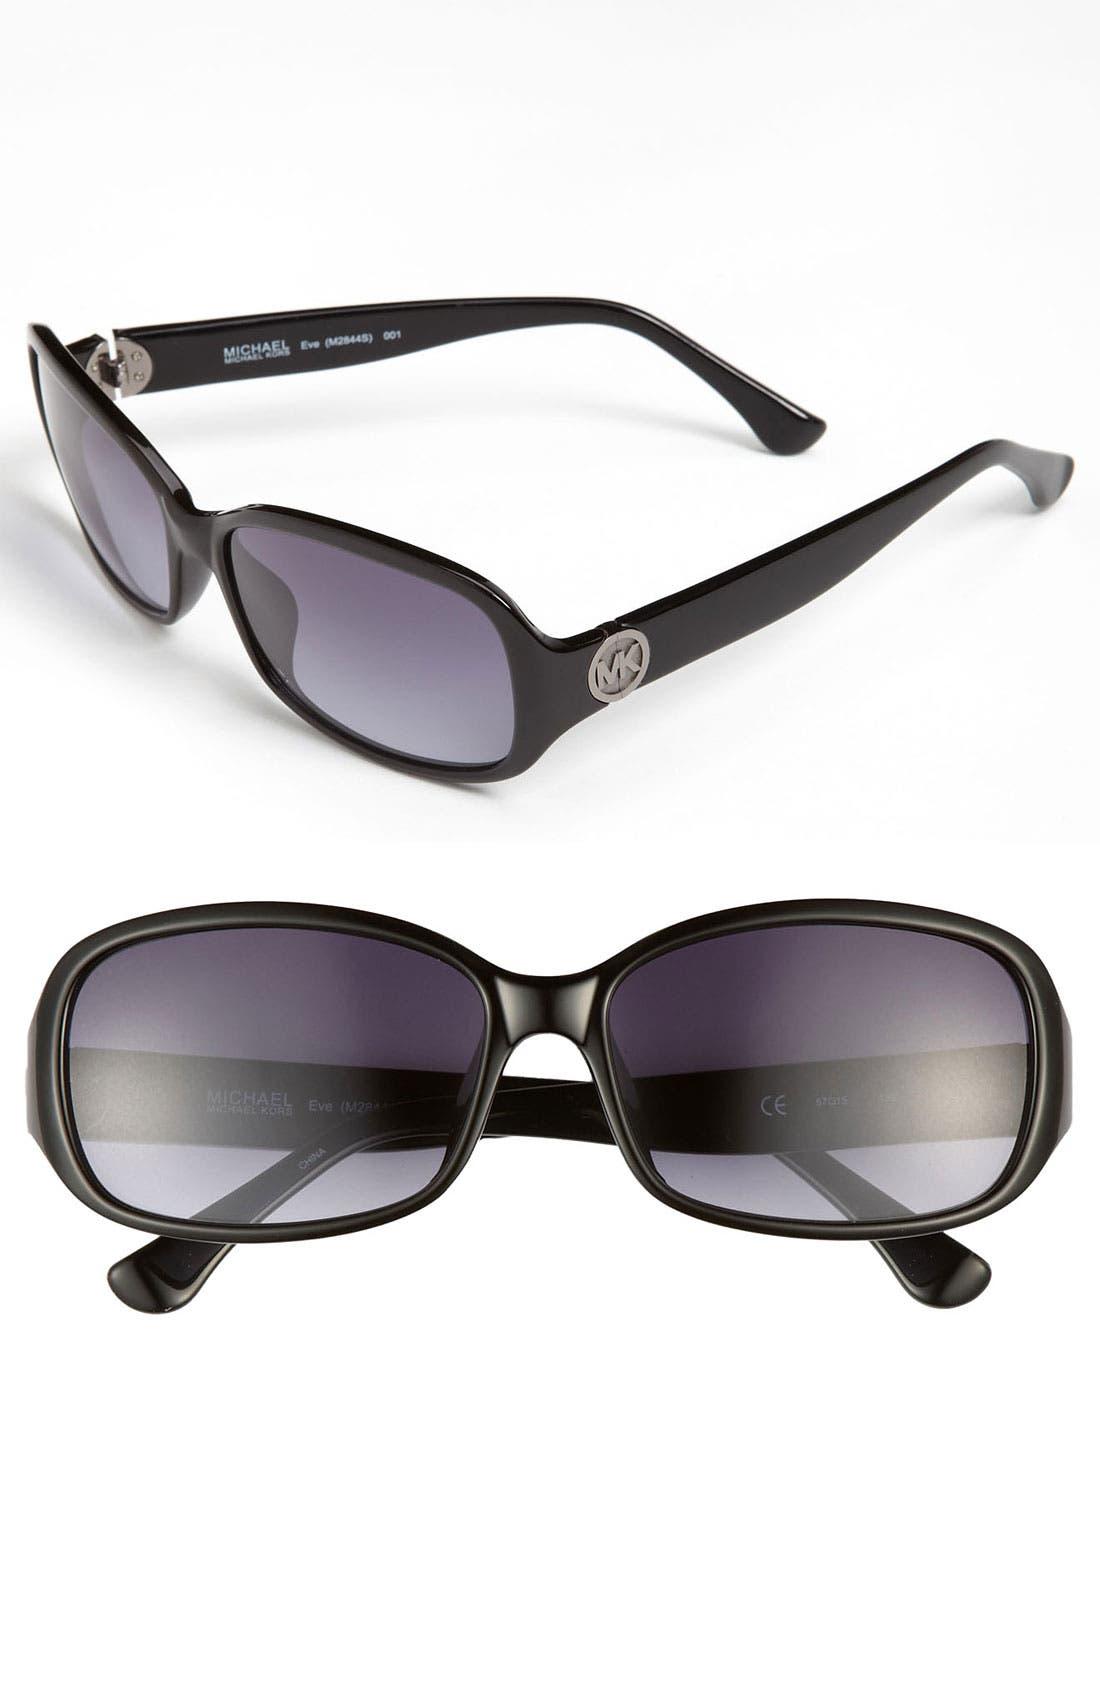 Main Image - MICHAEL Michael Kors 'Basic' 57mm Sunglasses